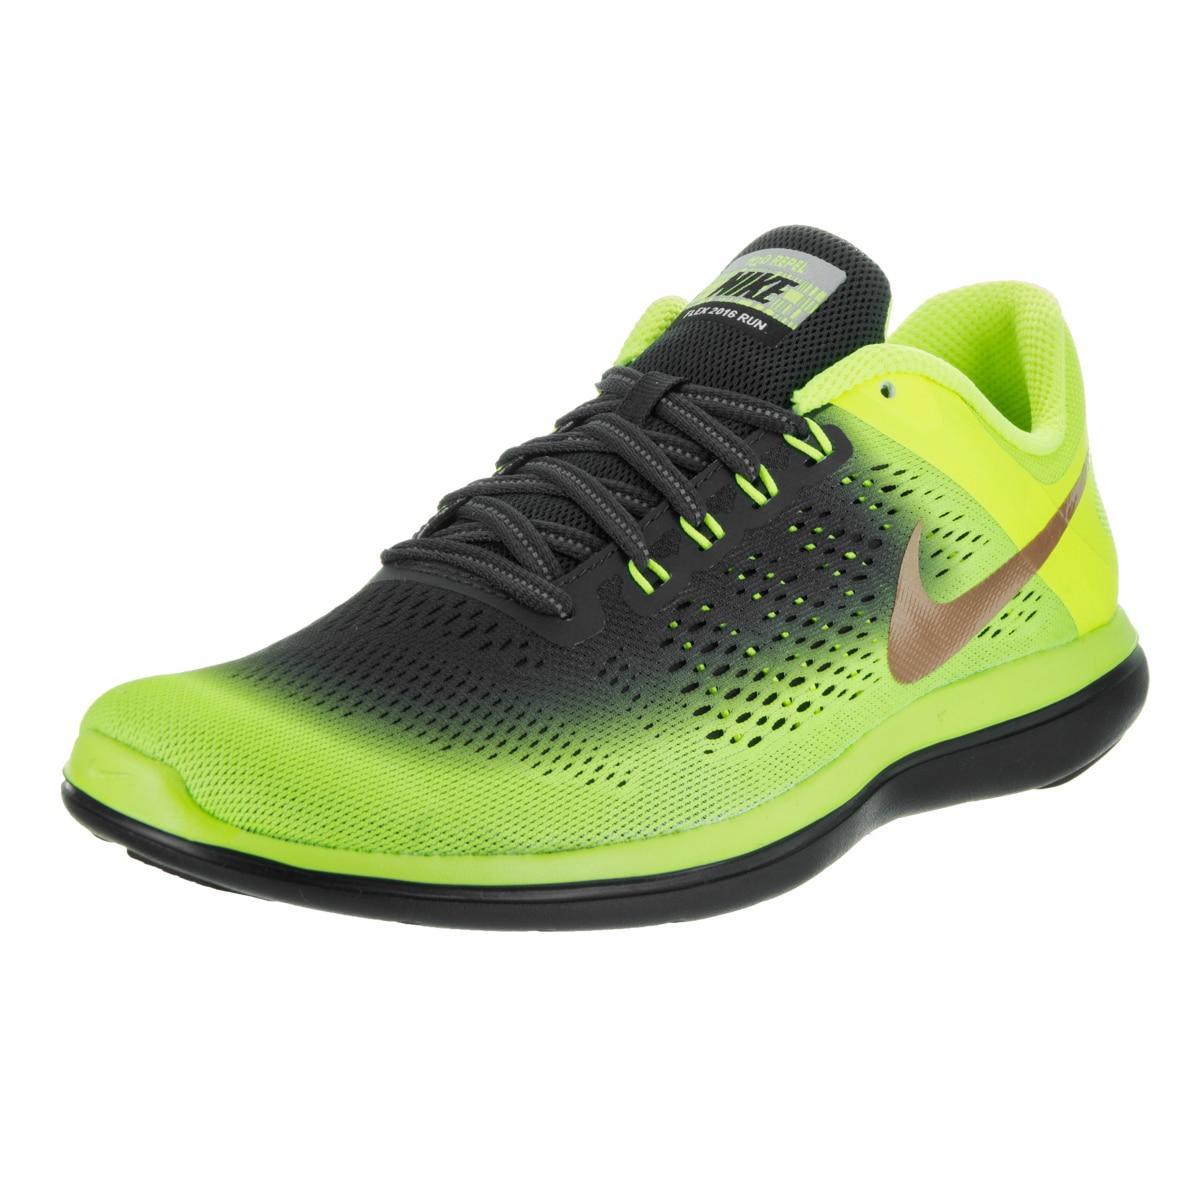 Entrada voluntario Engaño  Nike Men's Flex 2016 Rn Shield Running Shoes - Overstock - 13476374